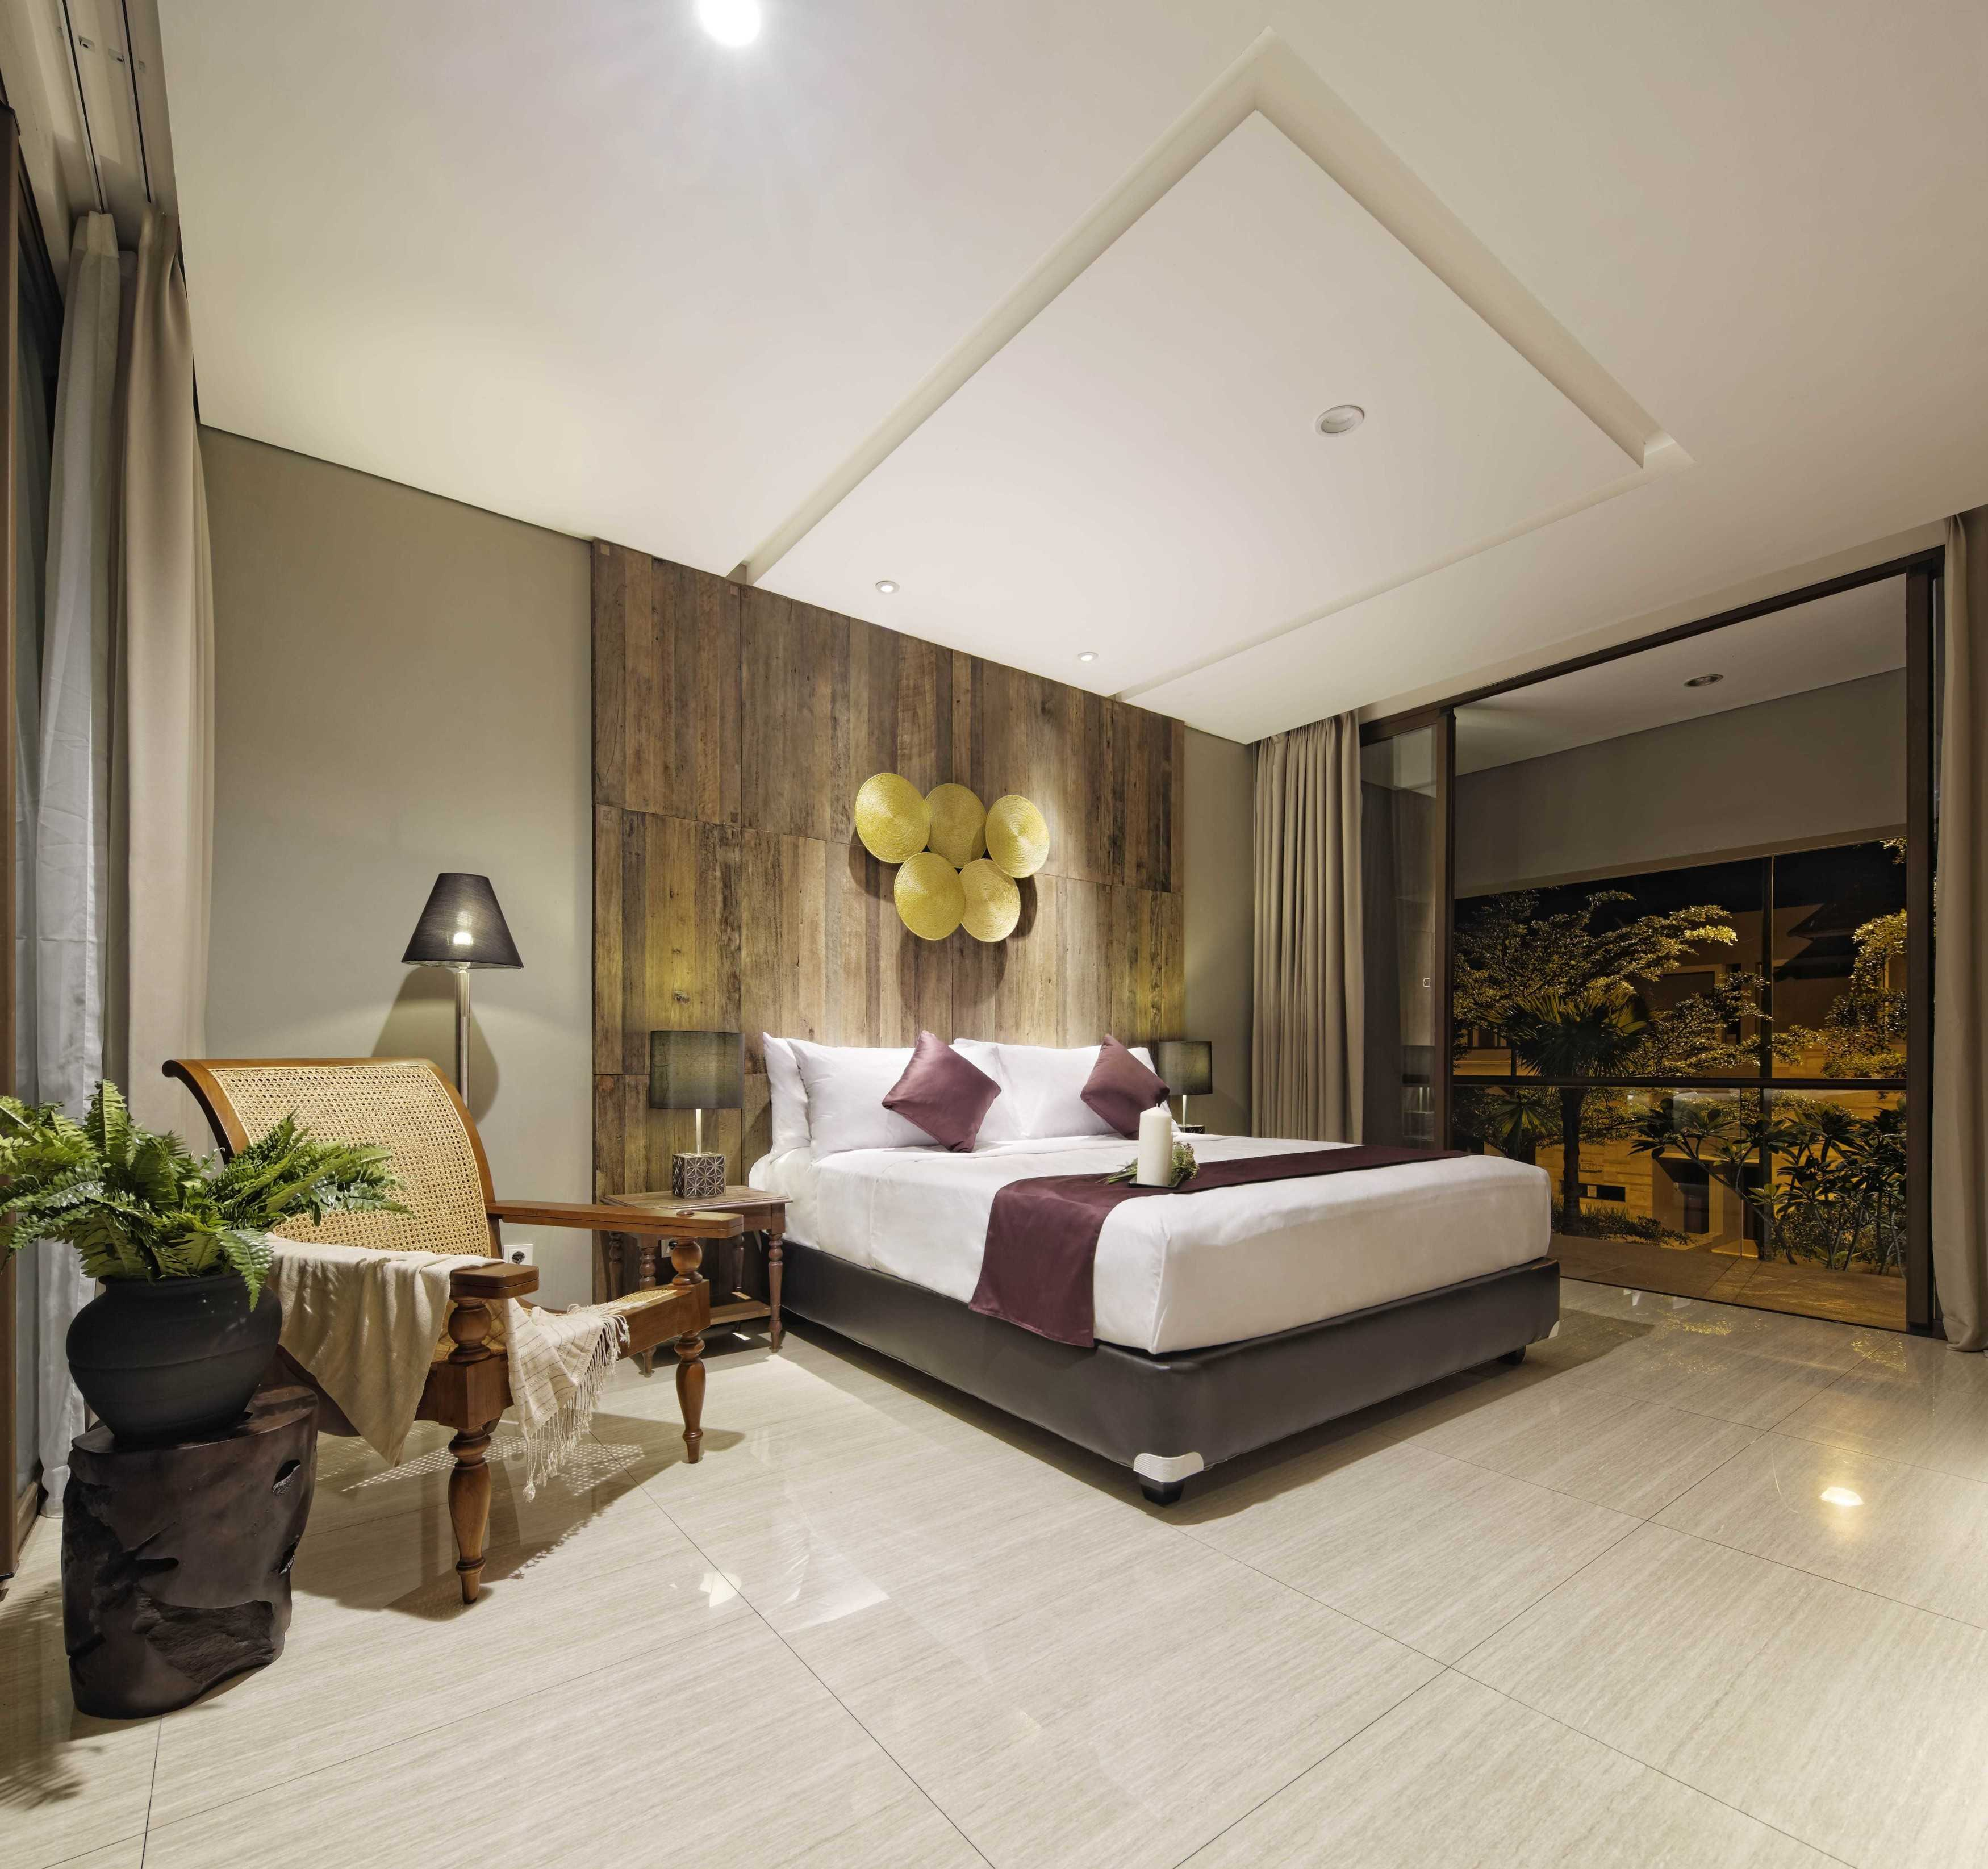 Pt. Modula Habitat At Hyarta Yogyakarta Yogyakarta Bedroom   26896